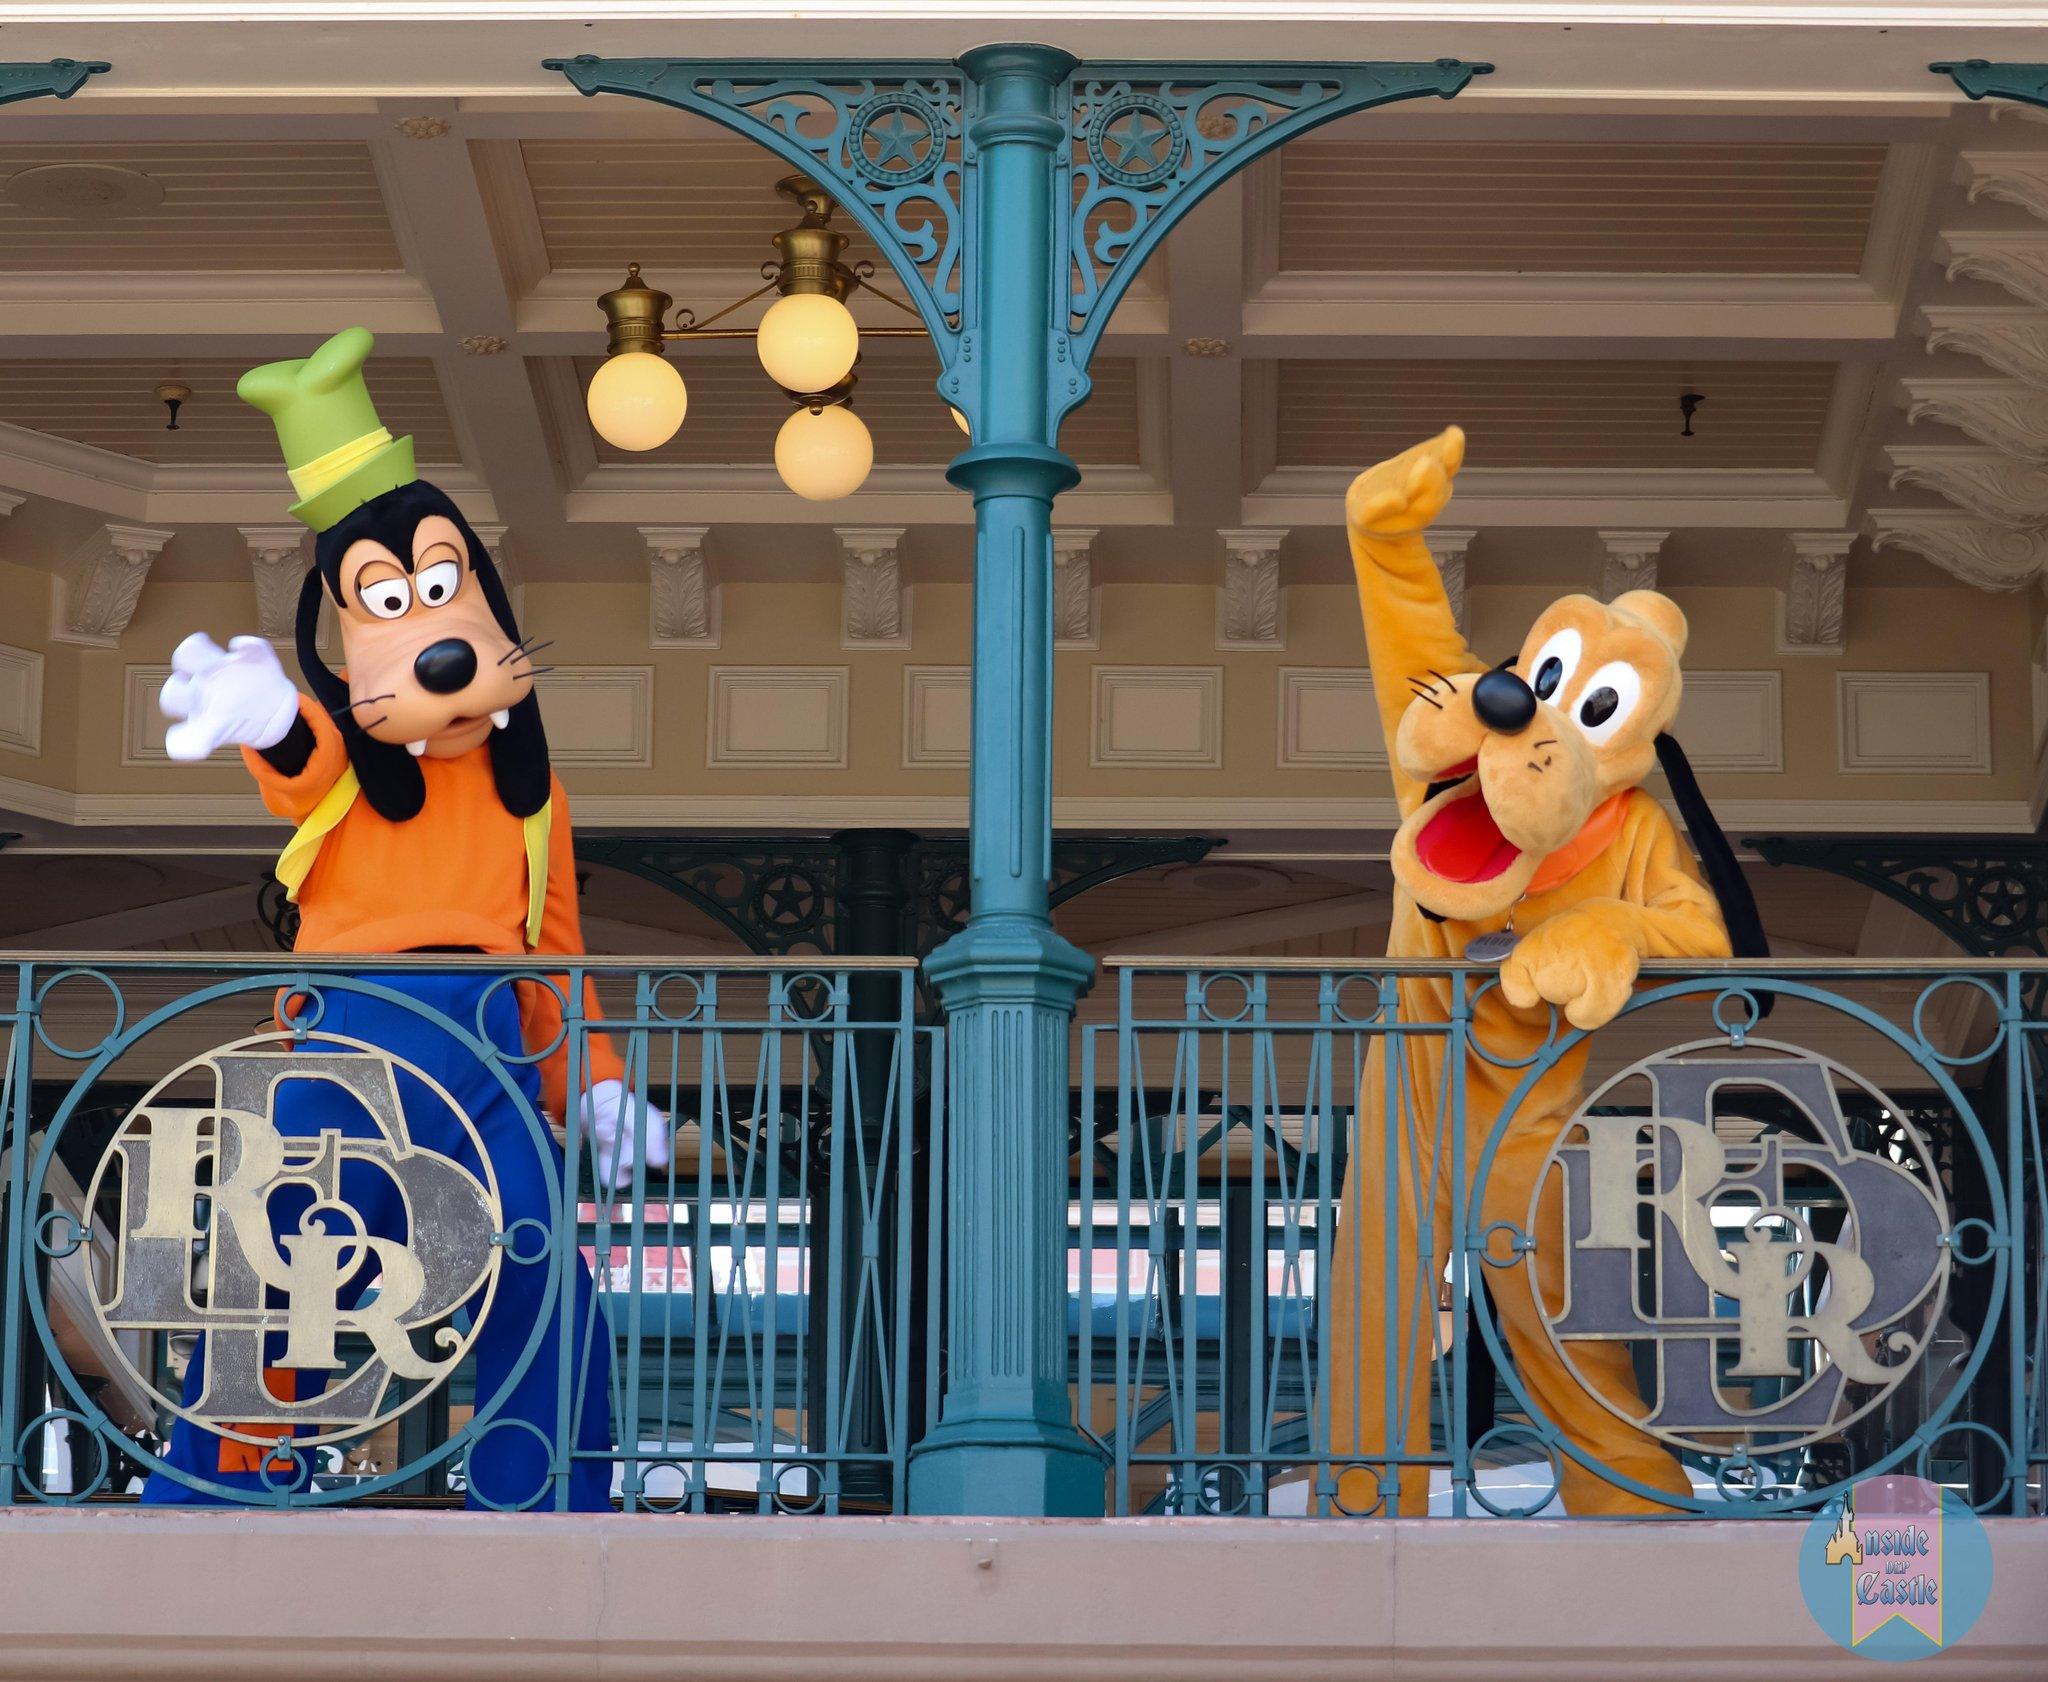 Disneyland Paris ouvert pendant la COVID-19 (juillet-octobre 2020)  - Page 2 EcrRXbNWAAAuFq3?format=jpg&name=large